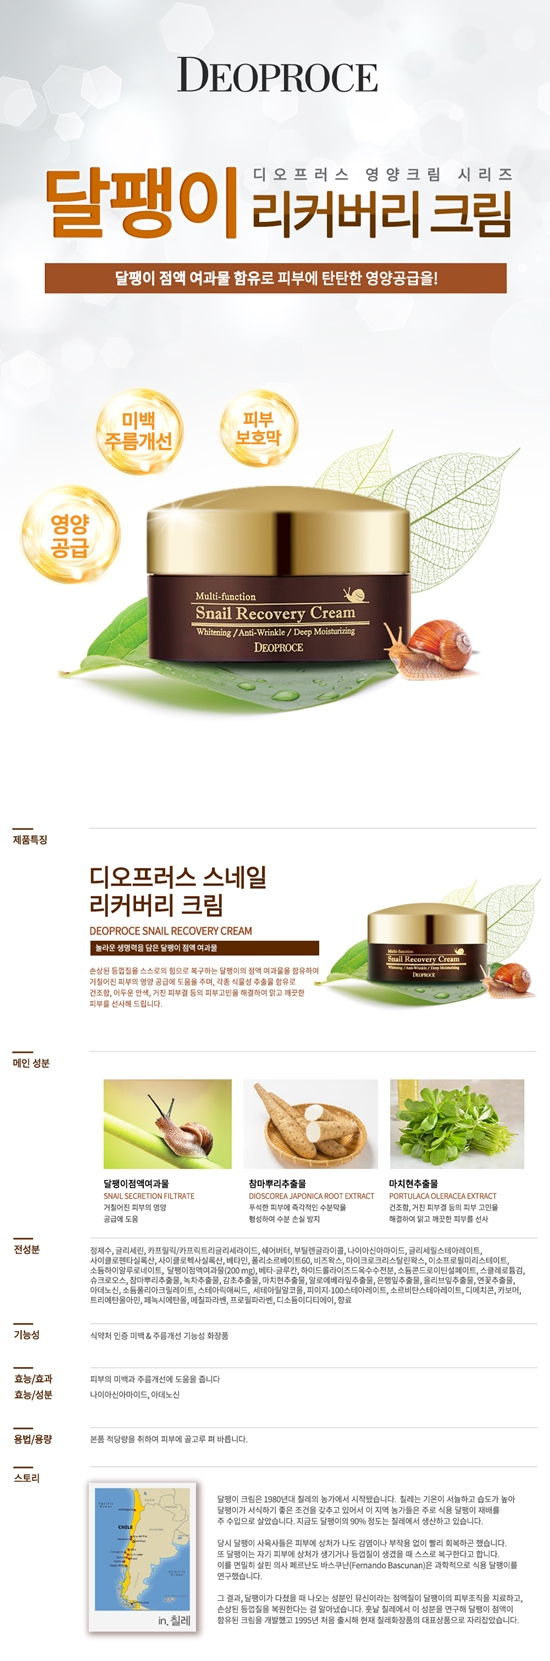 deoproce-snail-recovery-cream-info.jpg